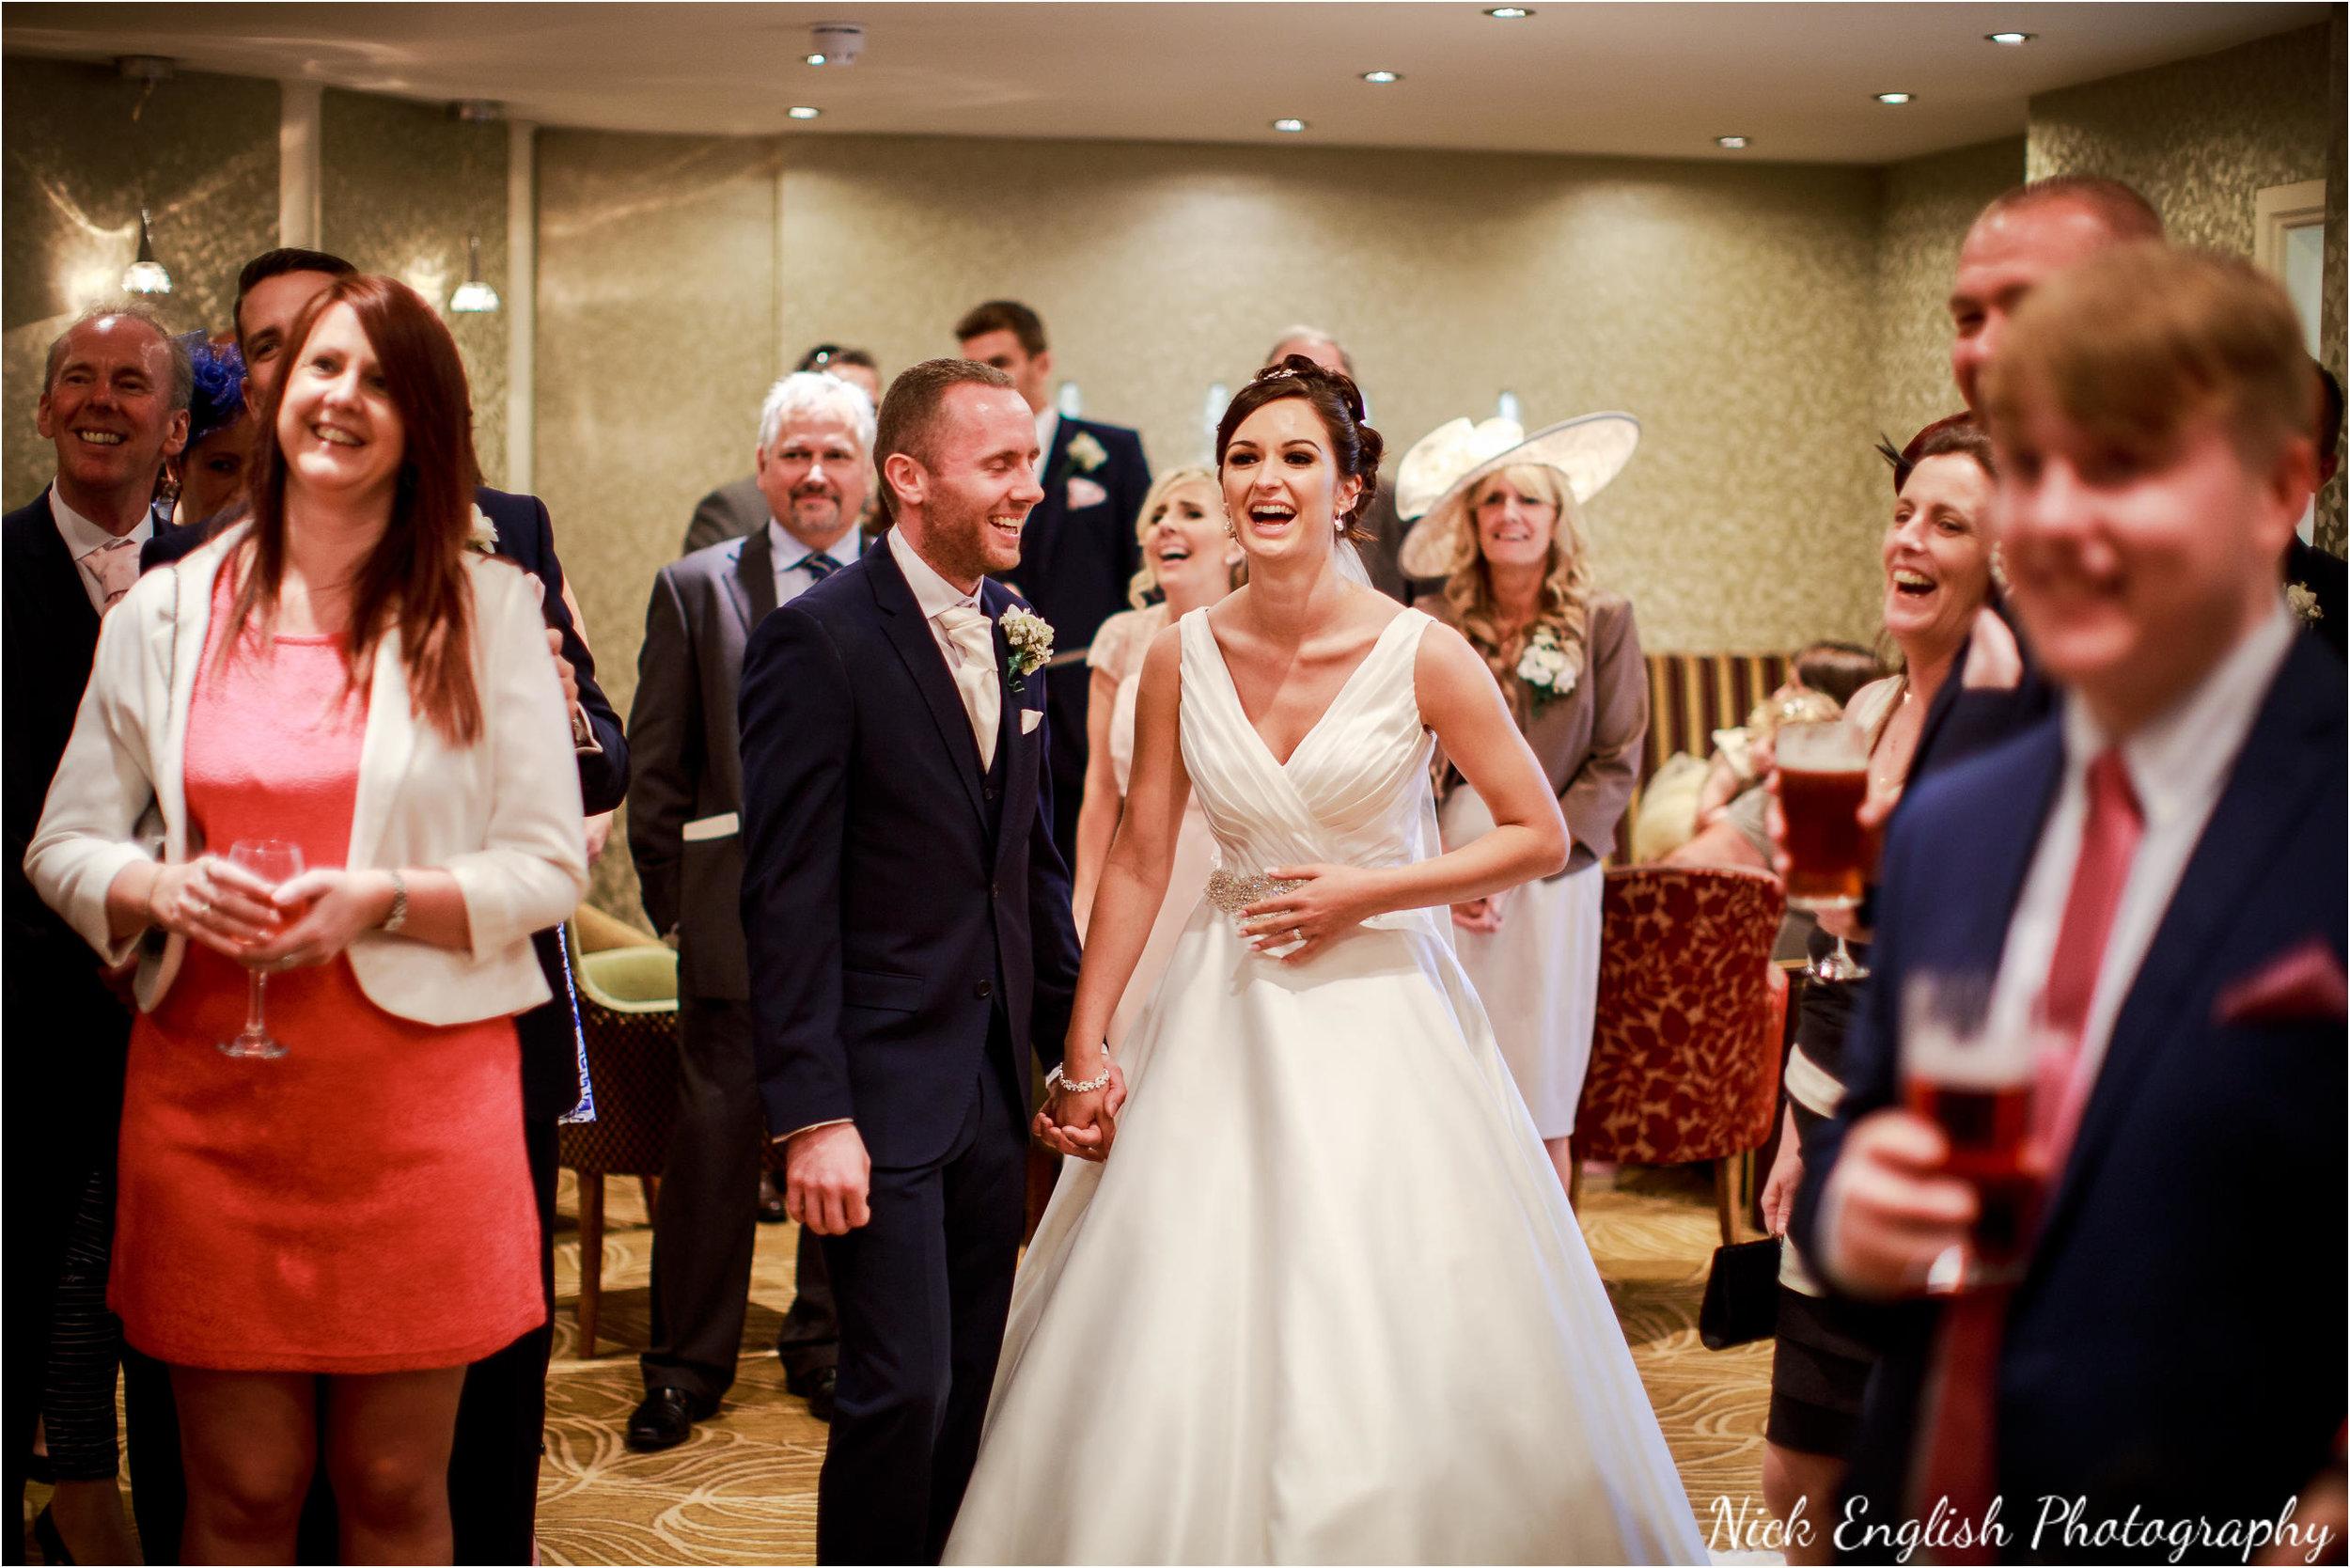 Emily David Wedding Photographs at Barton Grange Preston by Nick English Photography 159jpg.jpeg